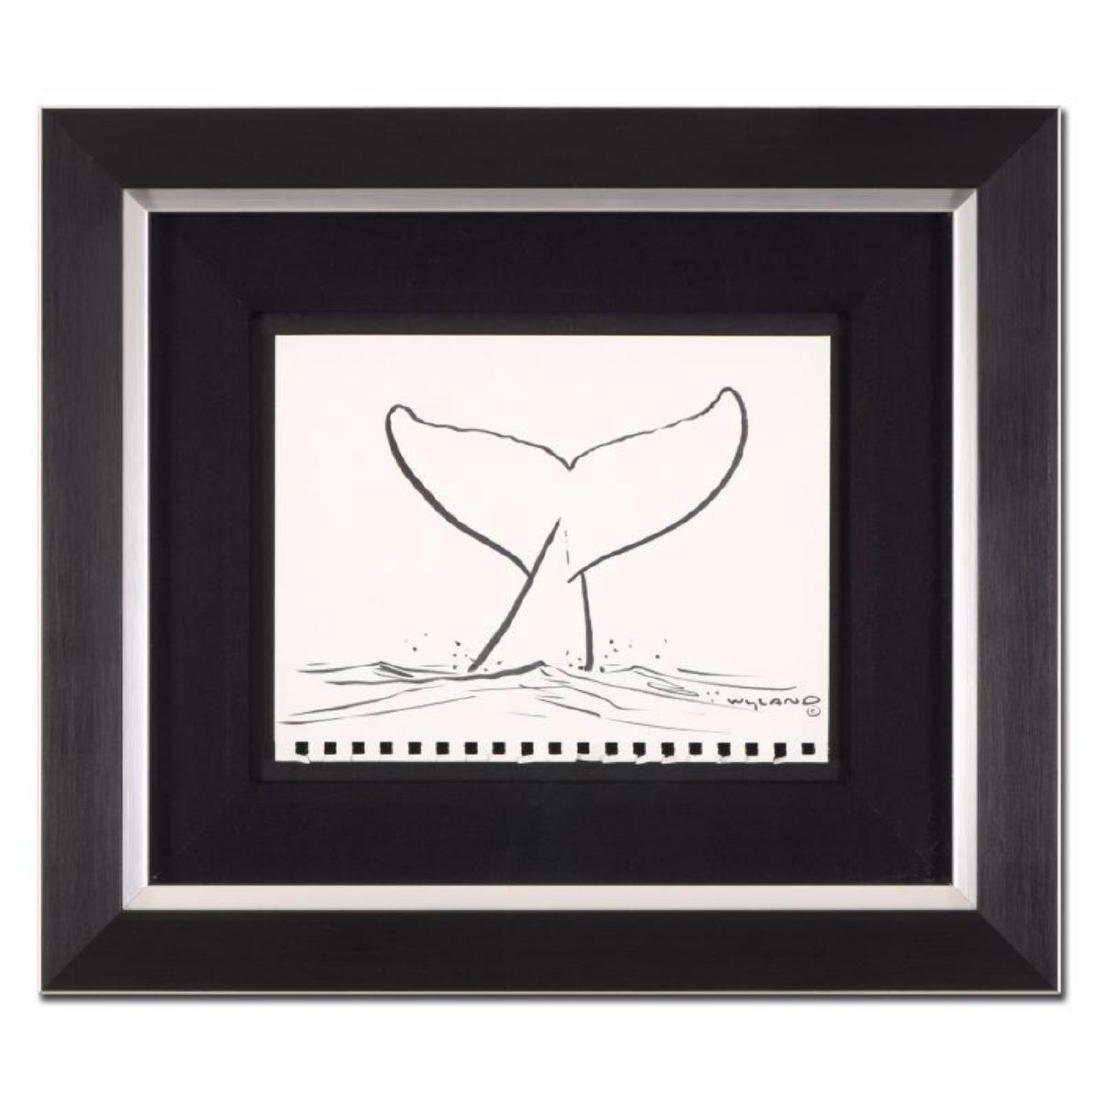 "Wyland - ""Whale Tail"" Framed Original Sketch, Hand"